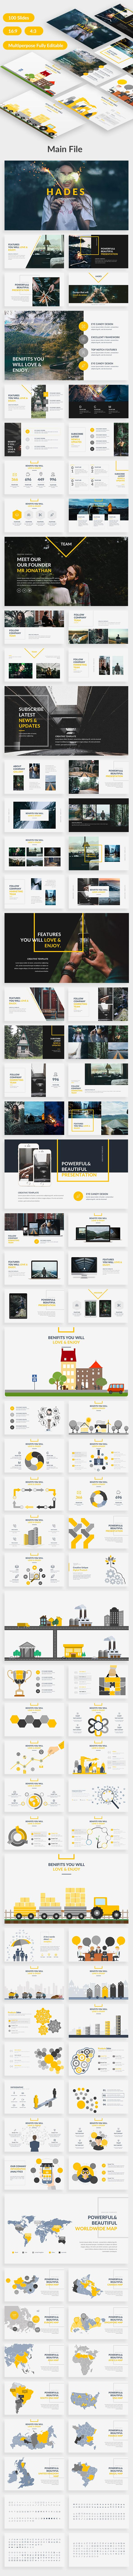 GraphicRiver Hades Creative Google Slide Template 20371204